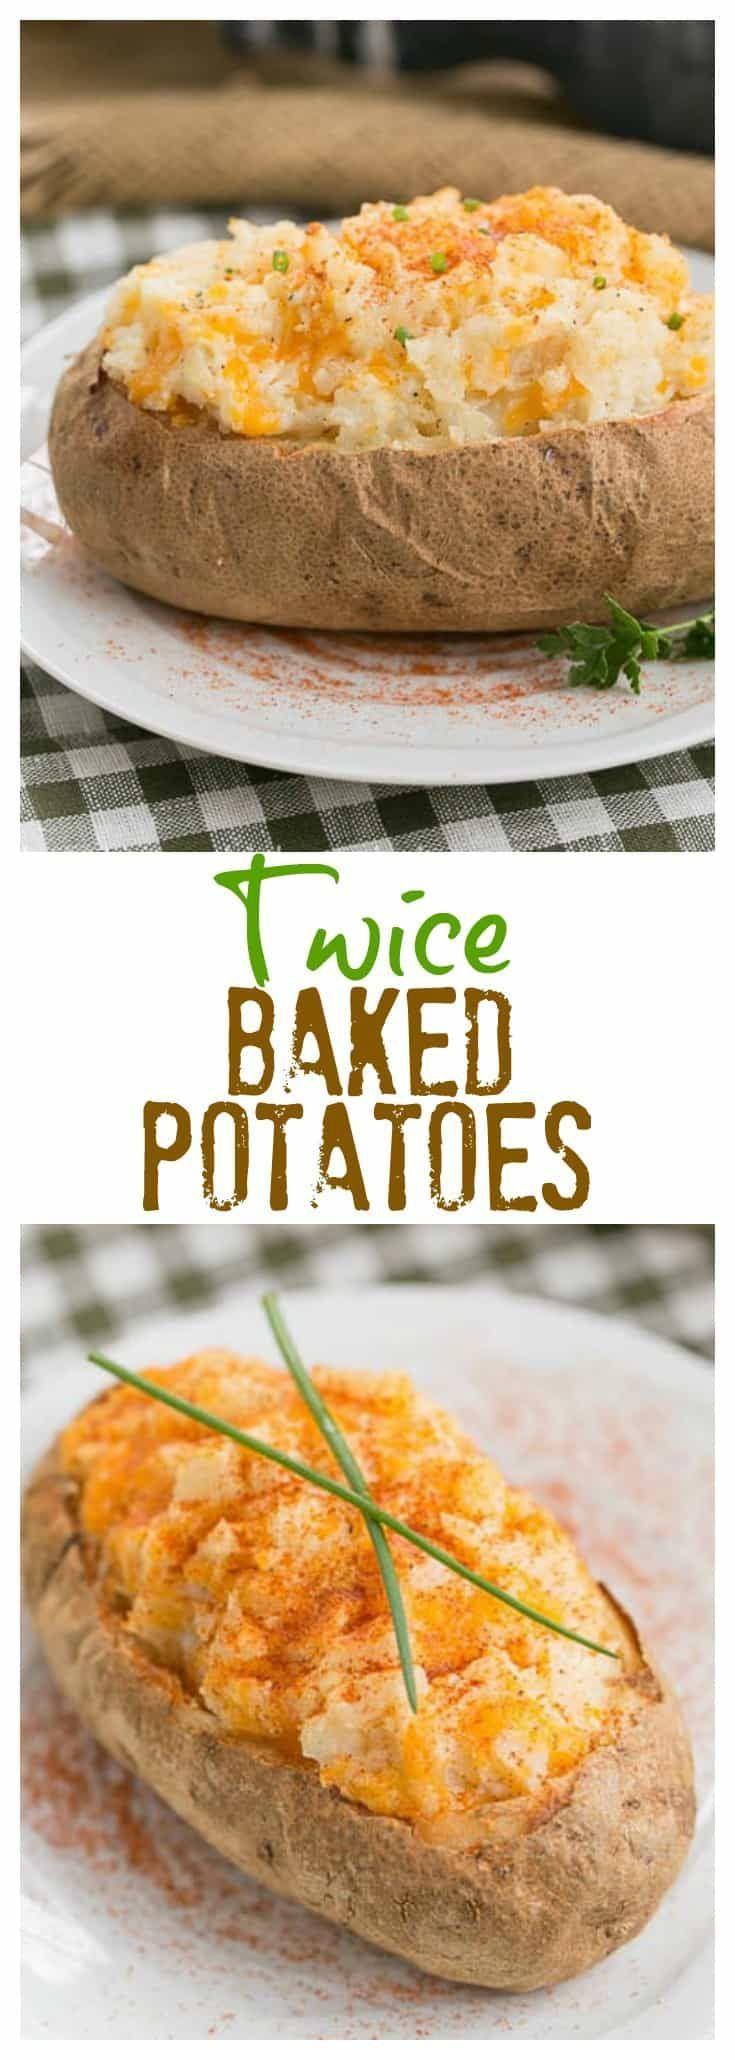 Twice Baked Potatoes | a no-brainer recipe that pushes baked potatoes over the top #potatoes #bakedpotato #sidedish #cheesy